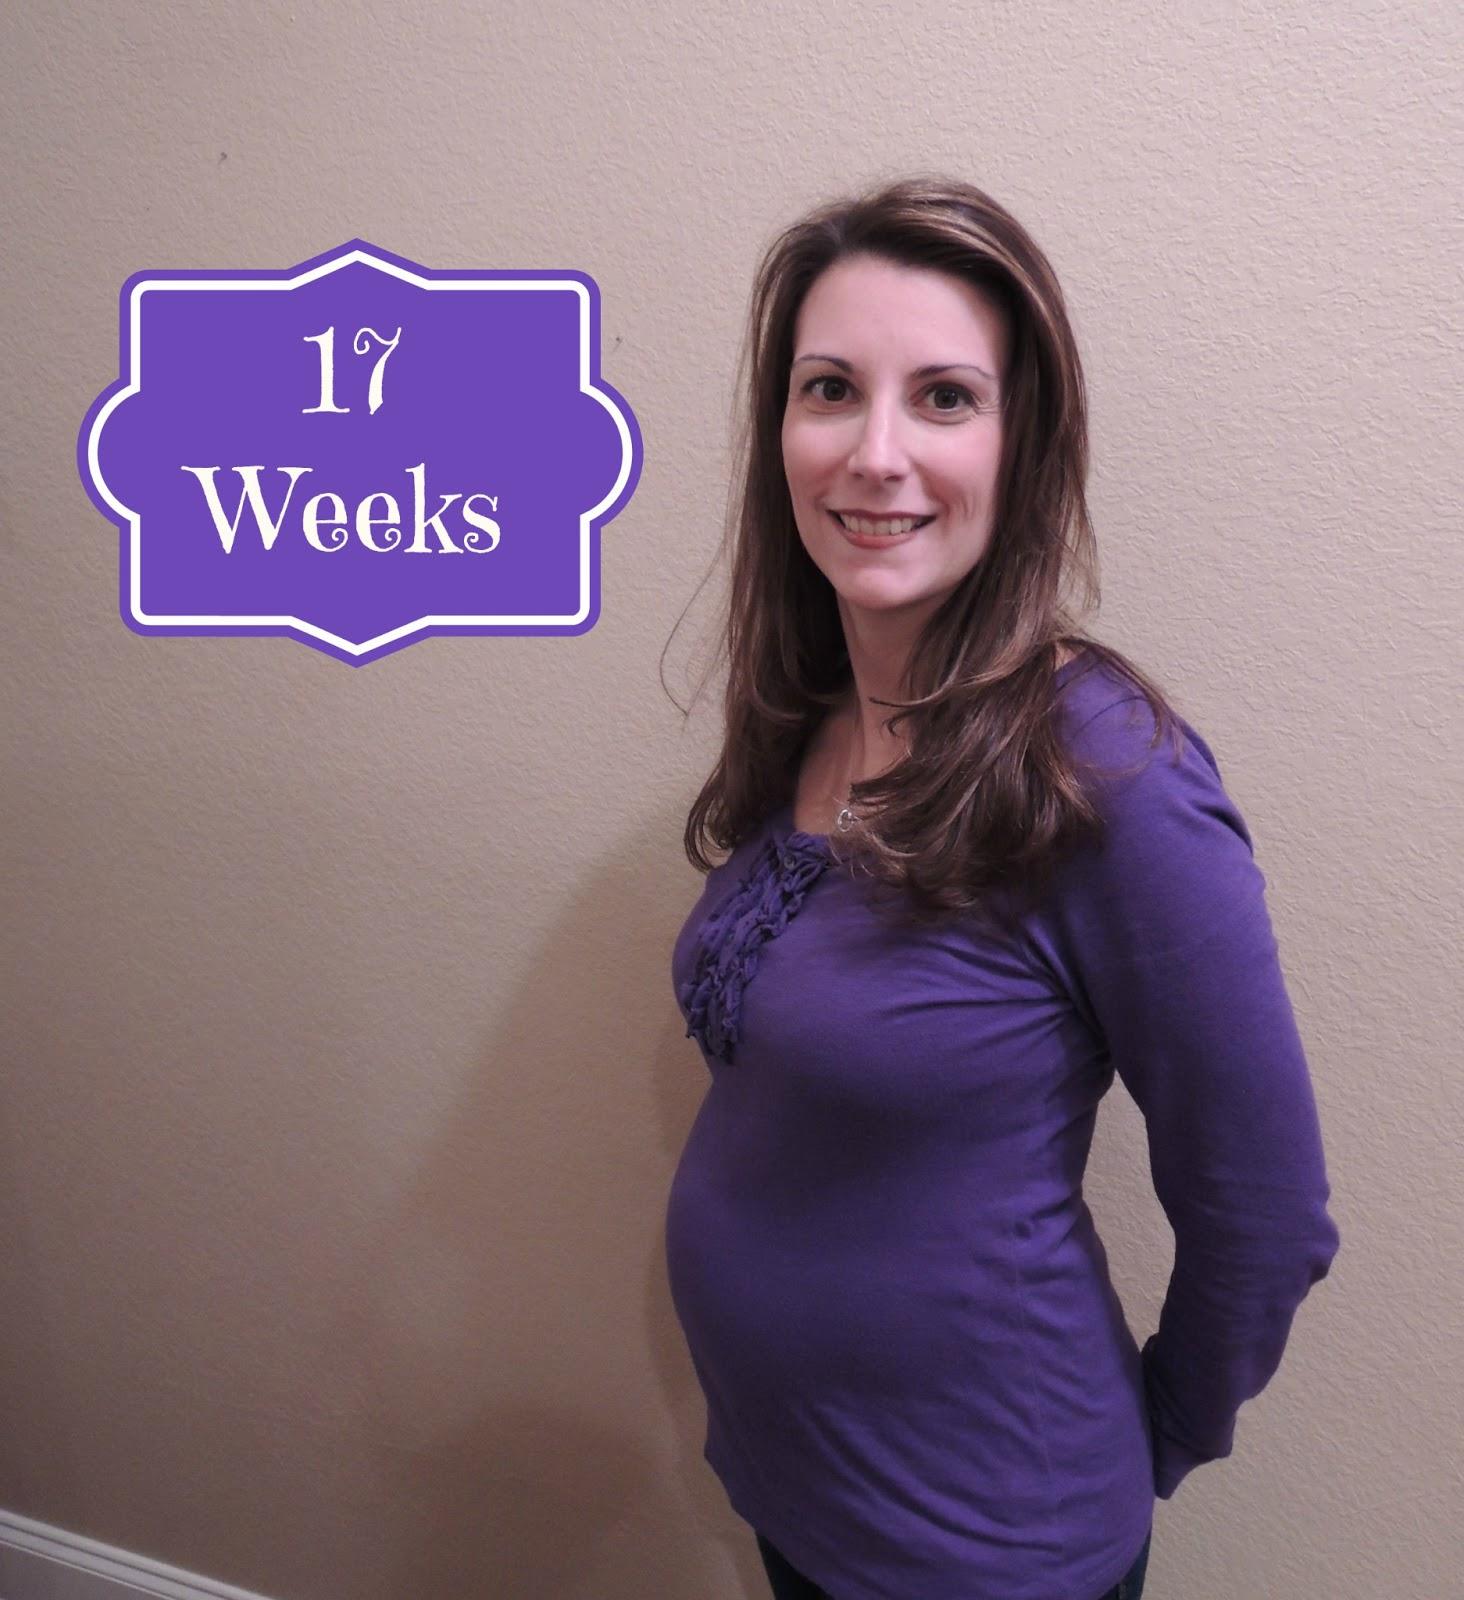 Lone Star Family Tummy Tracker 17 18 Weeks